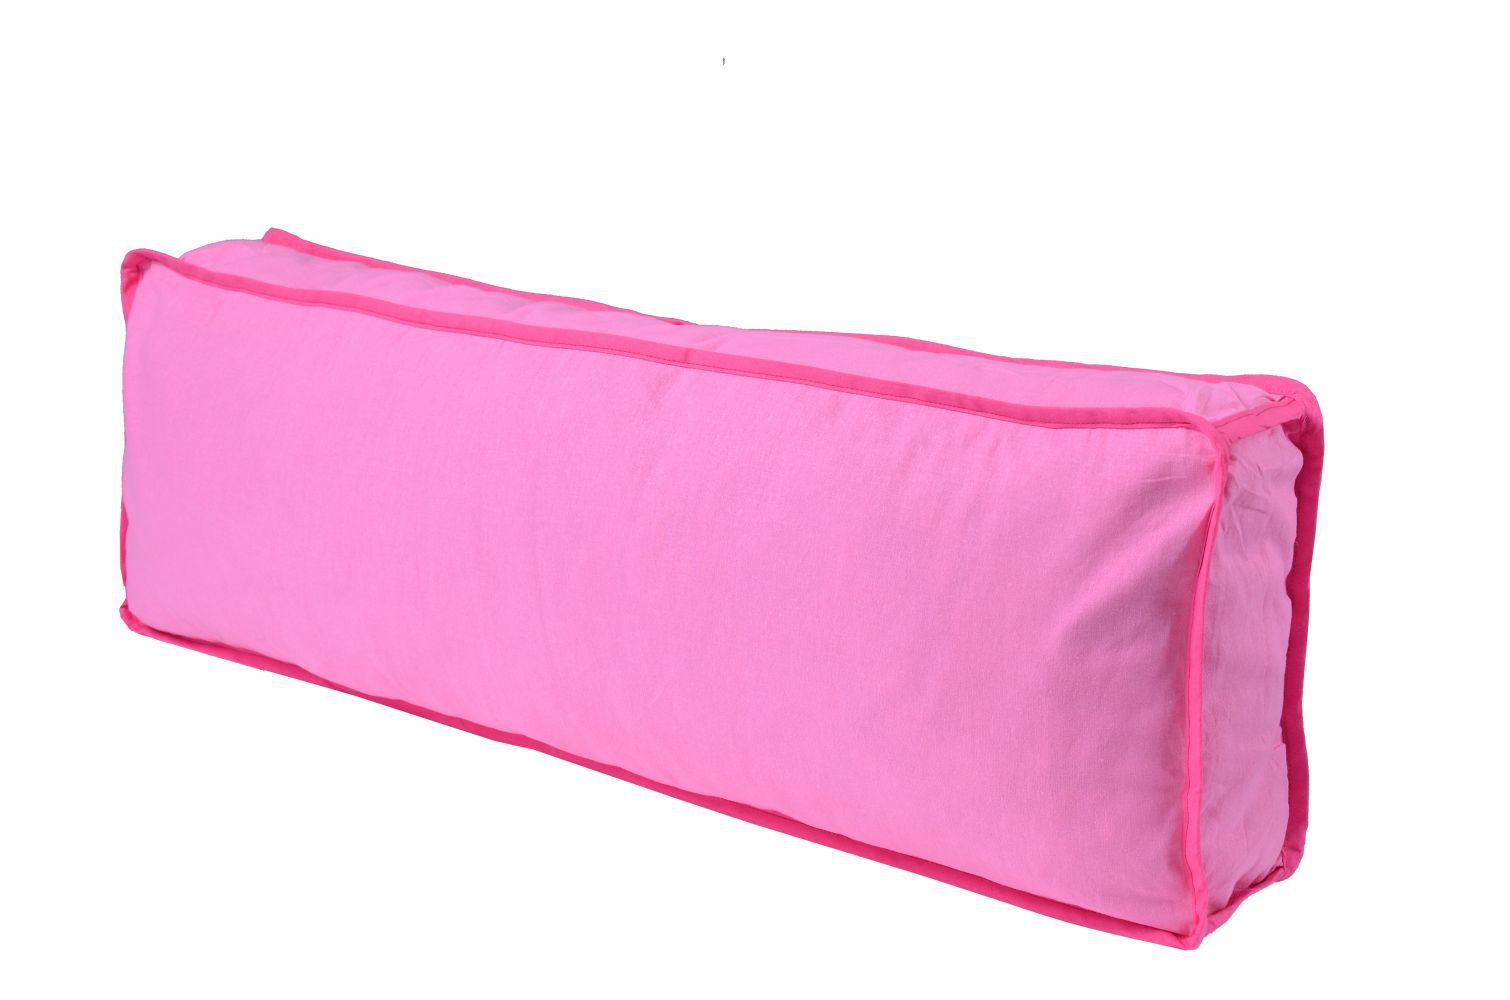 Seitenkissen - Farbe:Pink/Rosa